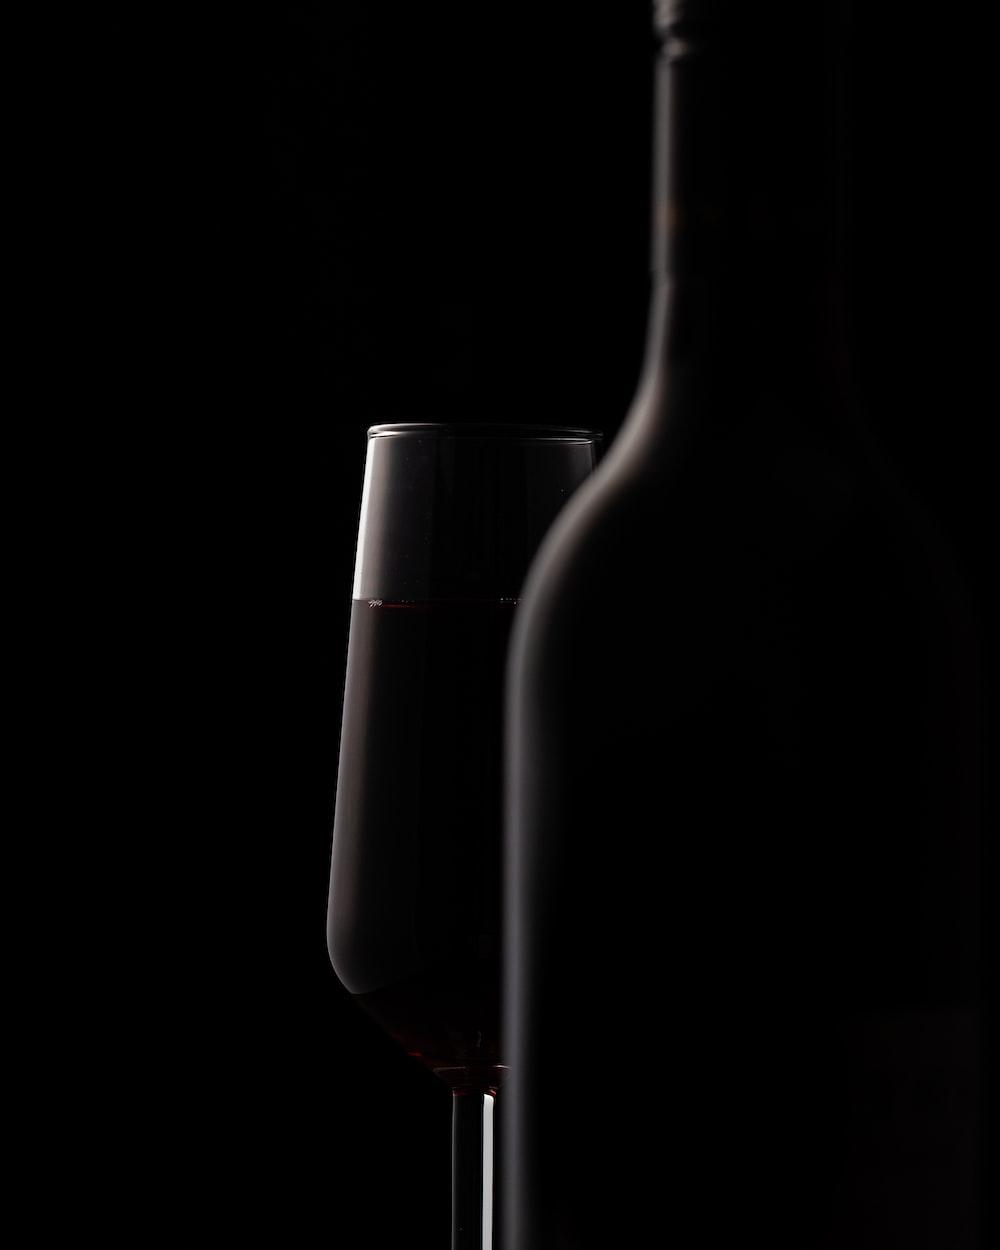 wine glass behind bottle